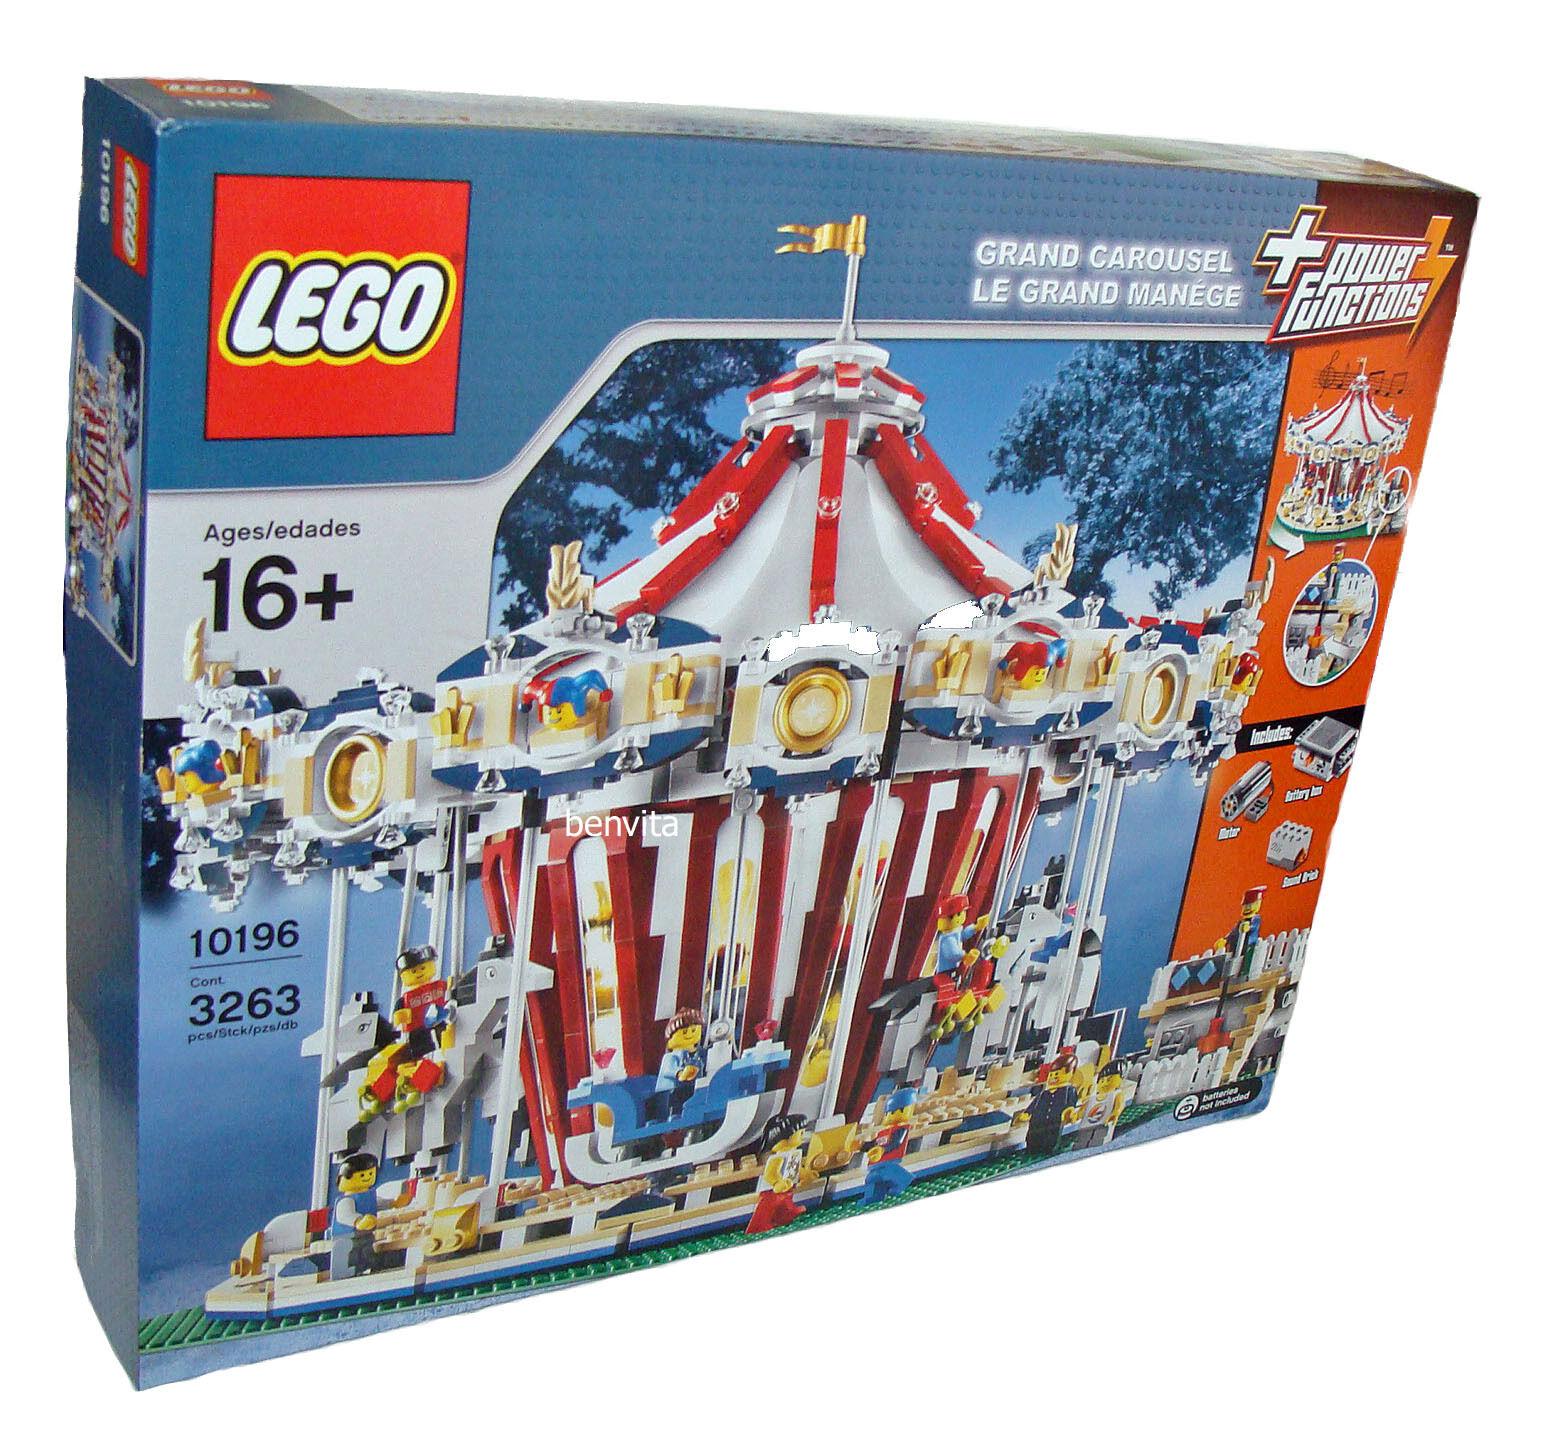 LEGO ® 10196-grande Carrousel GRAND Carousel 3263 pezzi 16+ - NUOVO